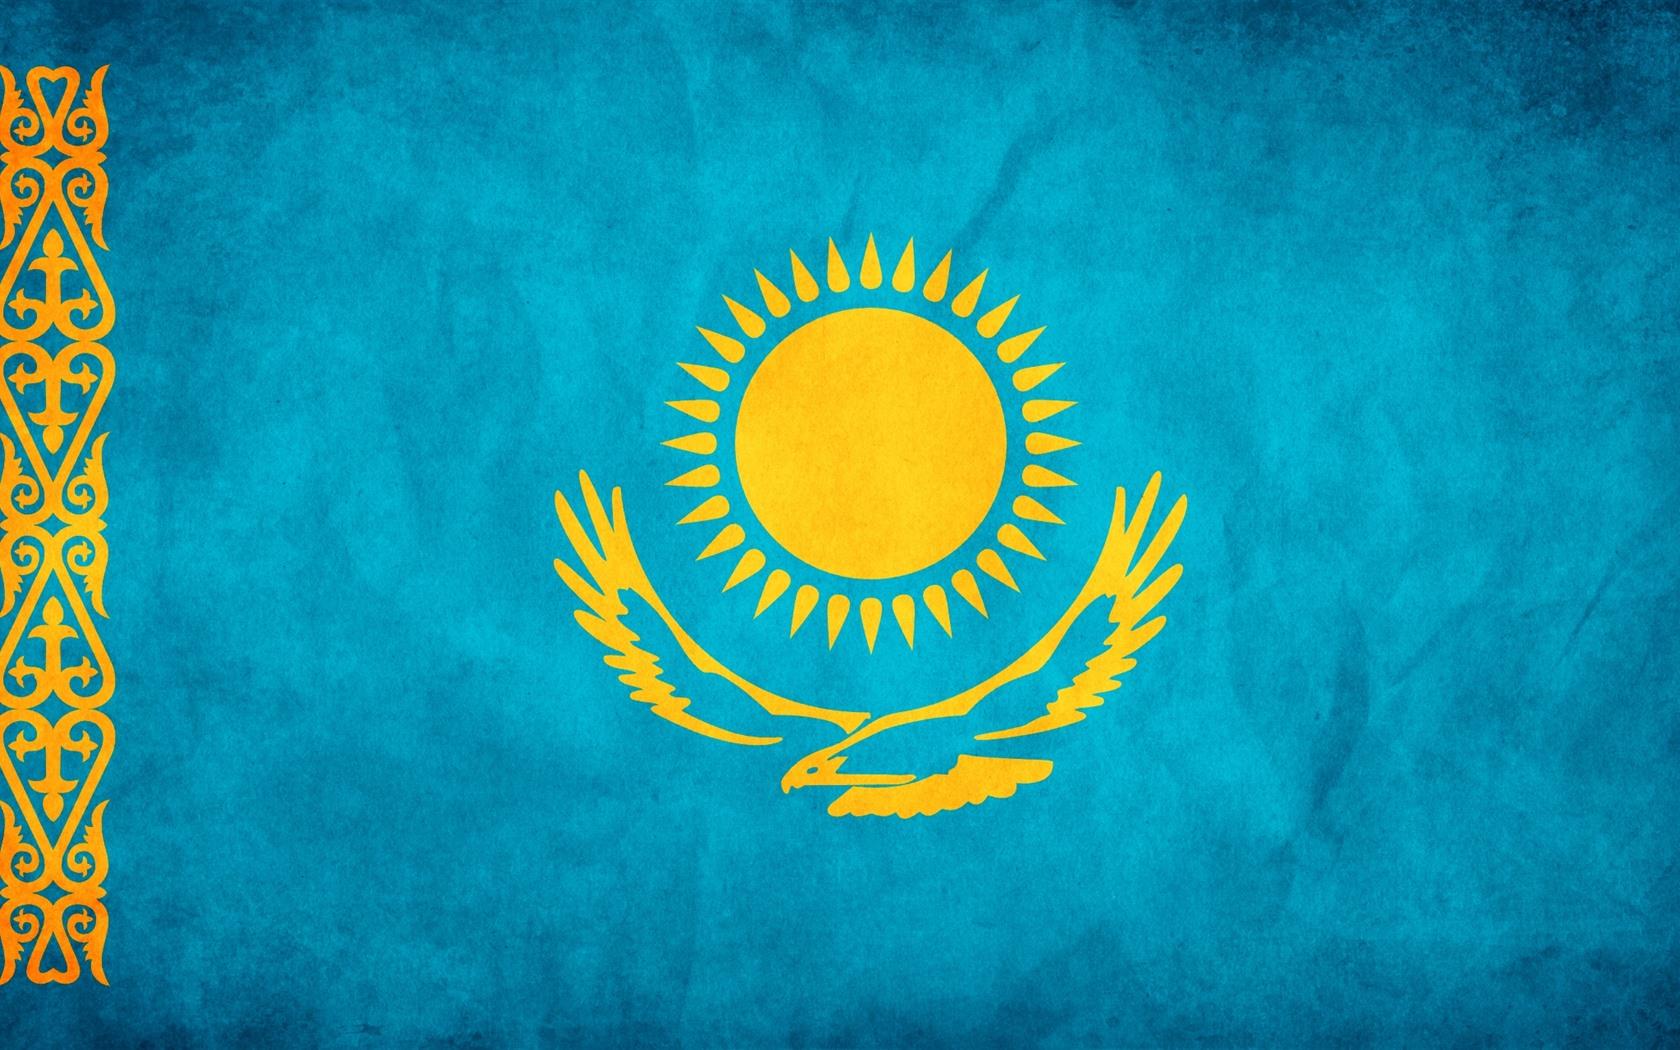 картинки флаг казахстана на обои сотового хотел австралию